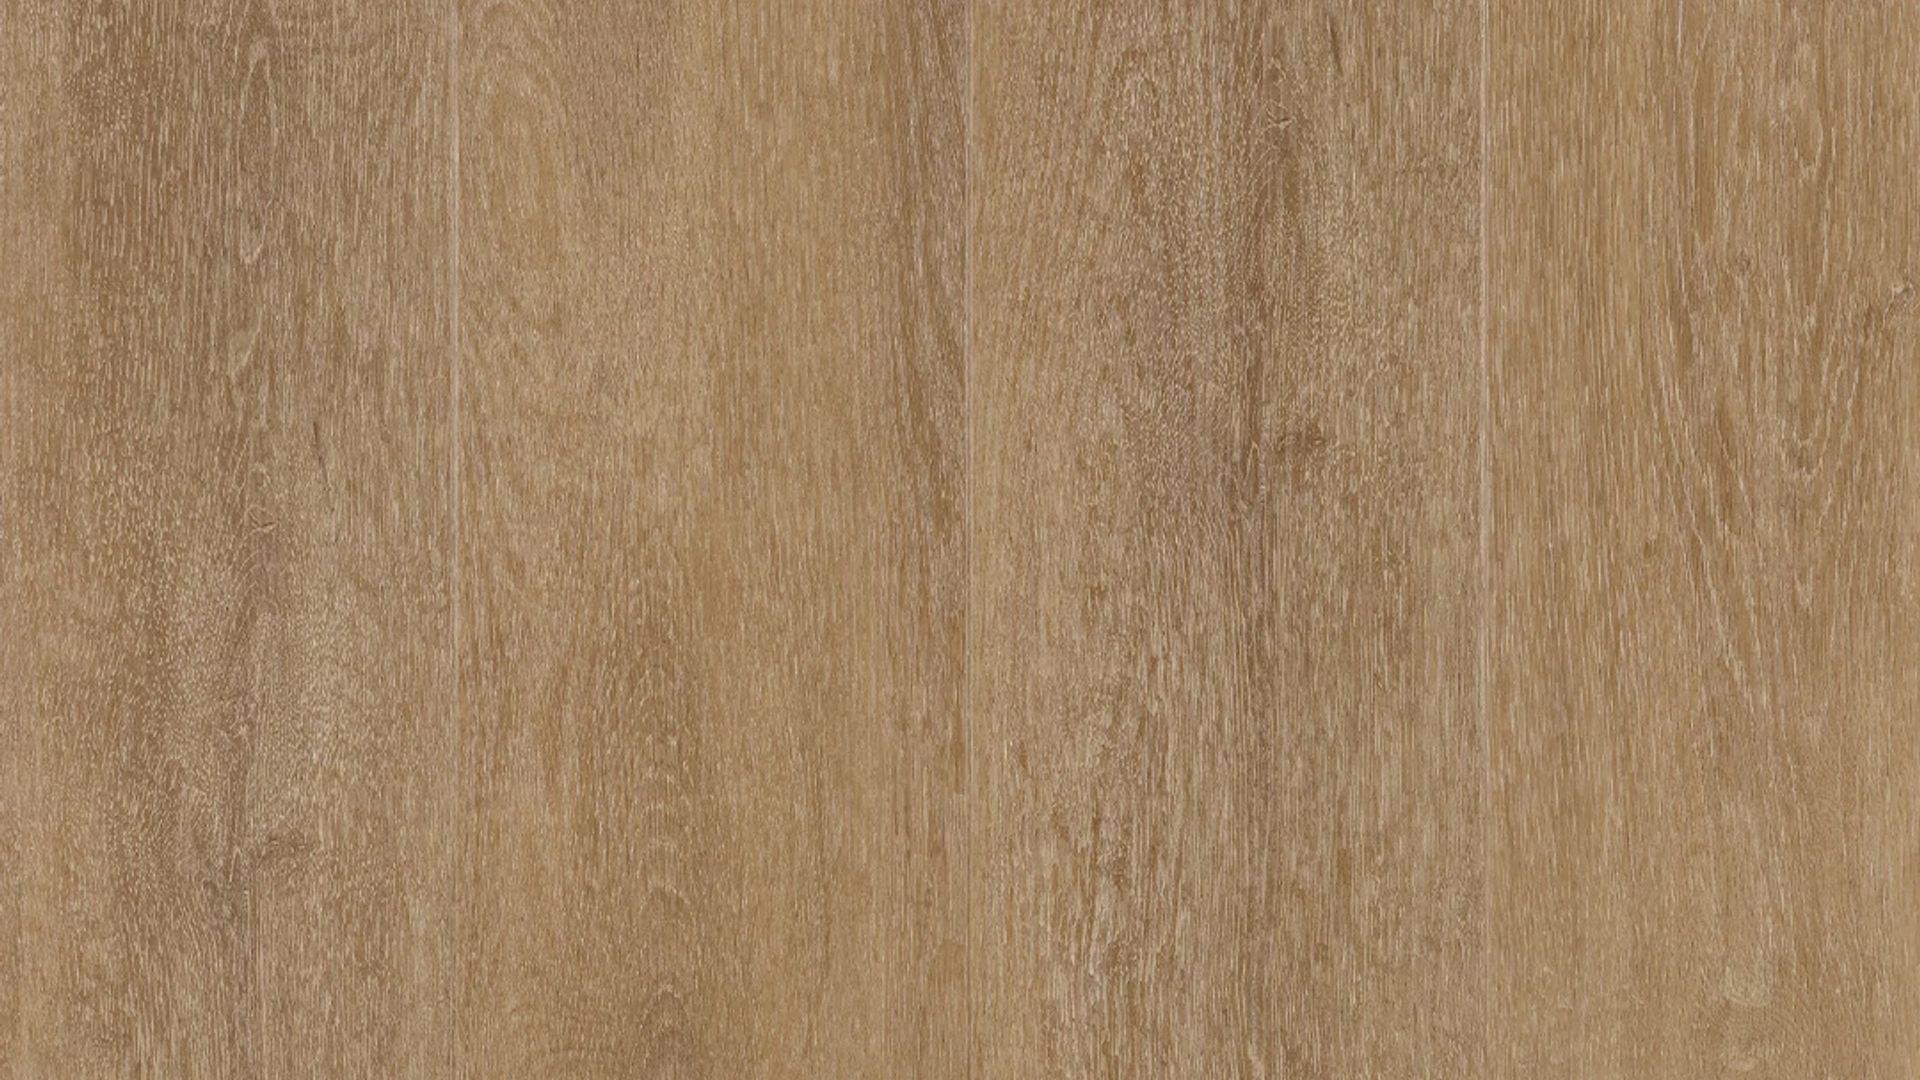 Lumber EVP Vinyl Flooring Product Shot